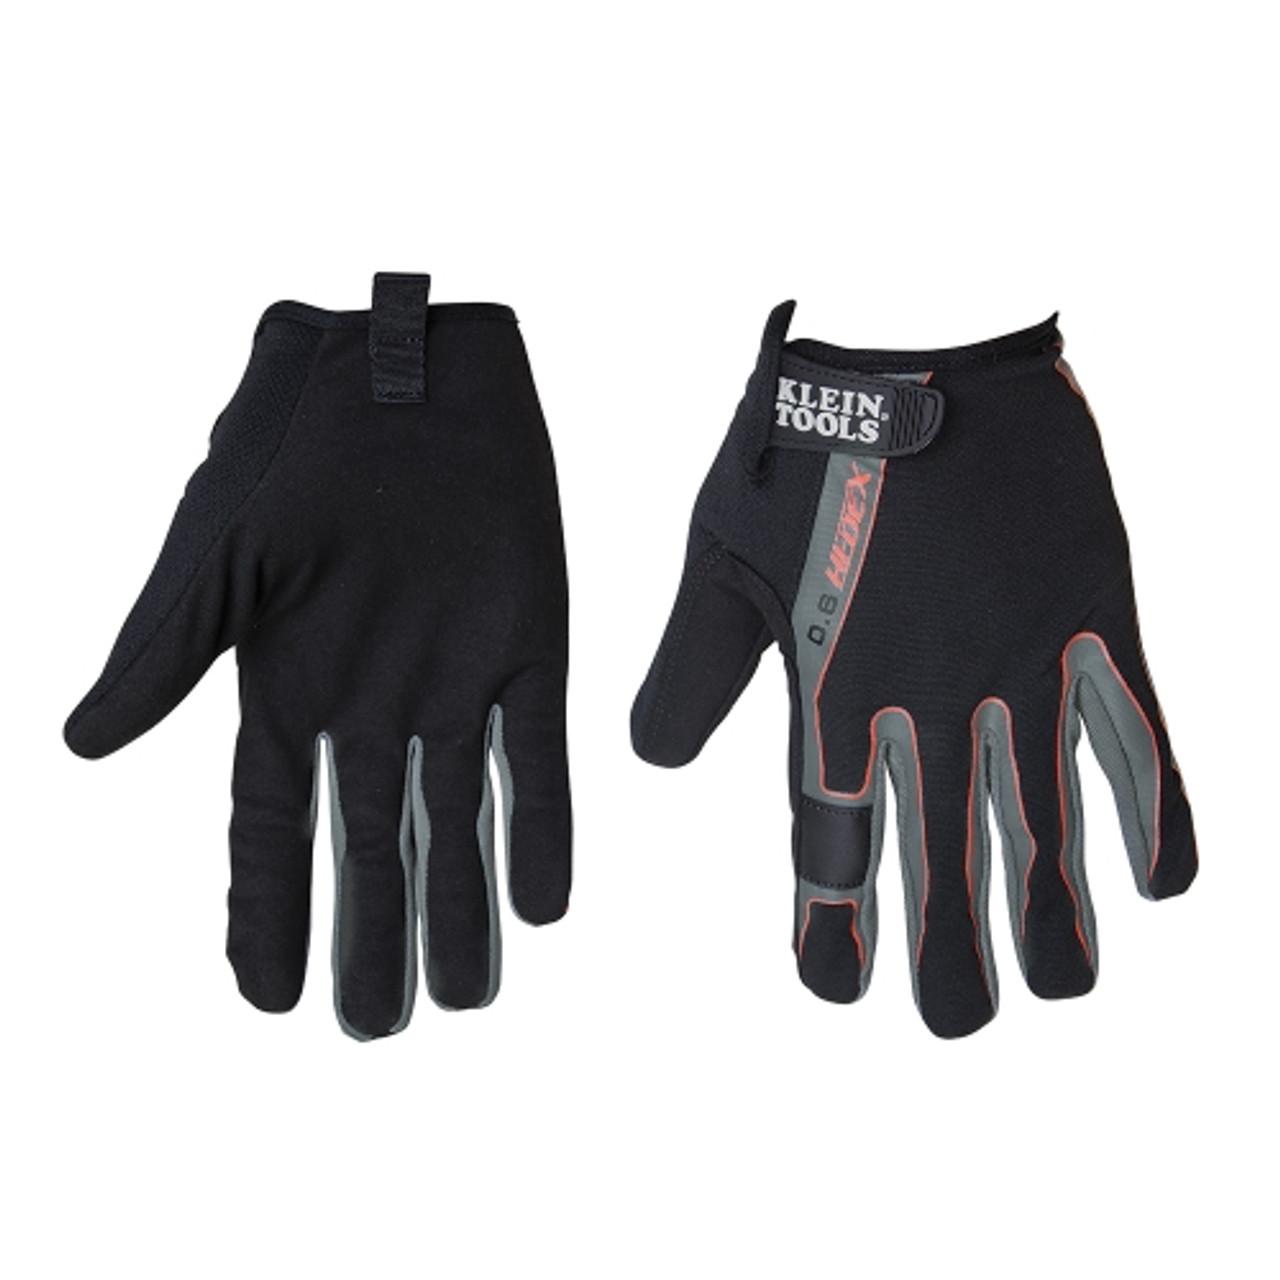 Klein 40231 High Dexterity Touchscreen Gloves, X-Large